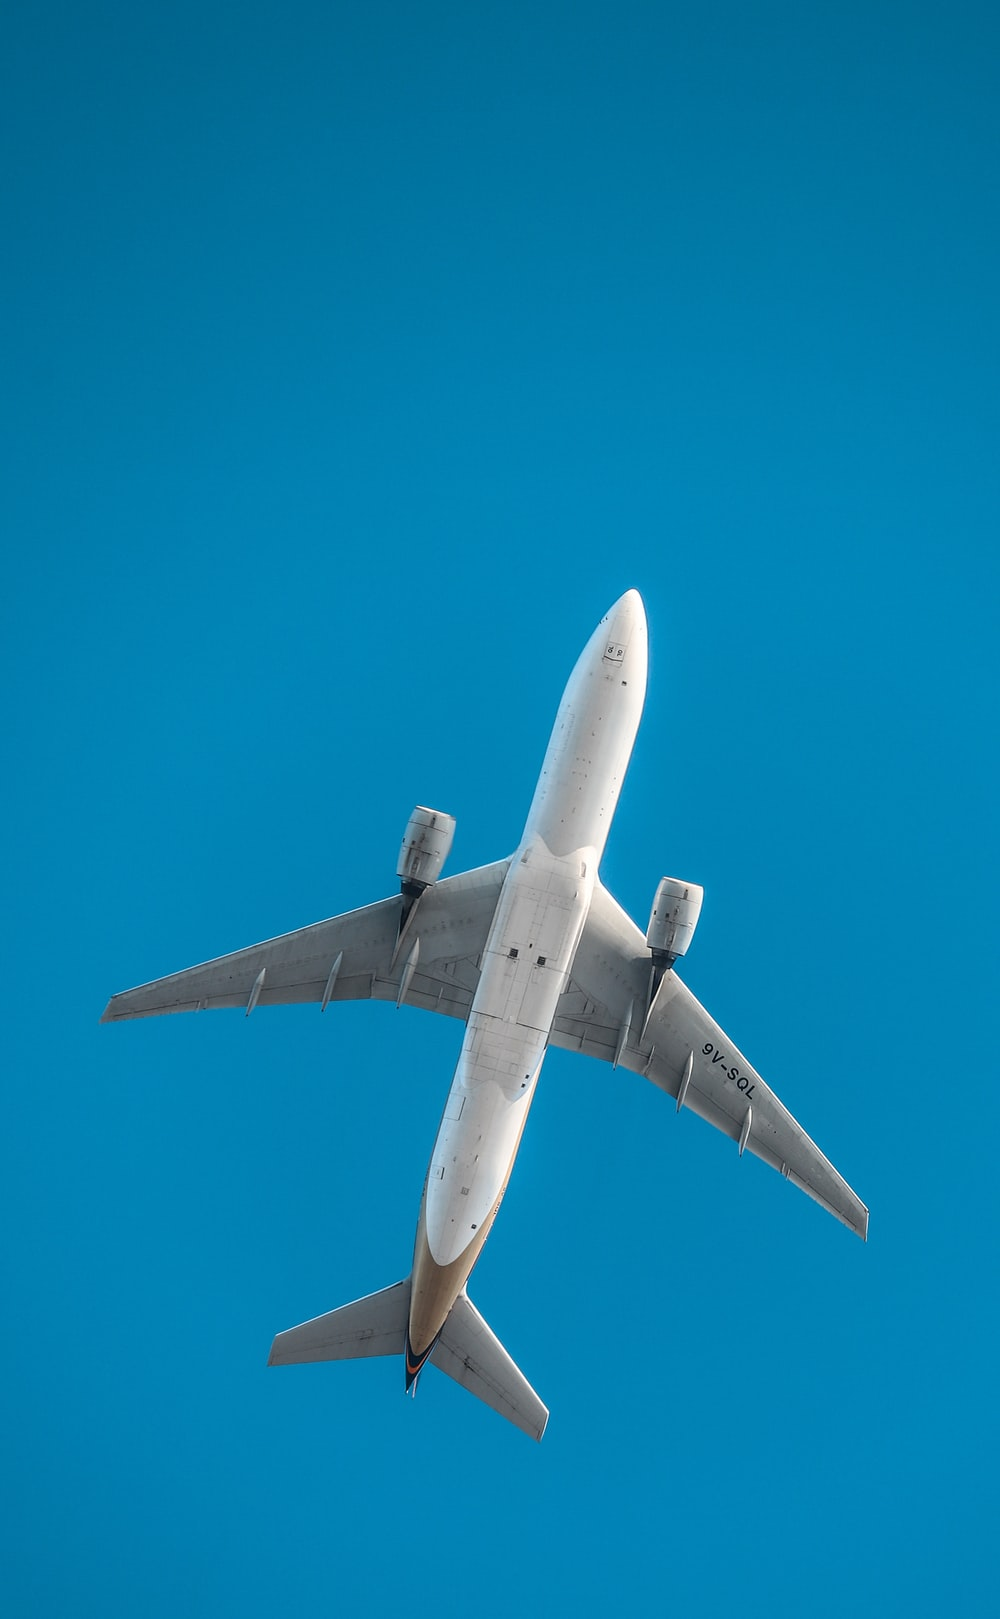 white and gray plane